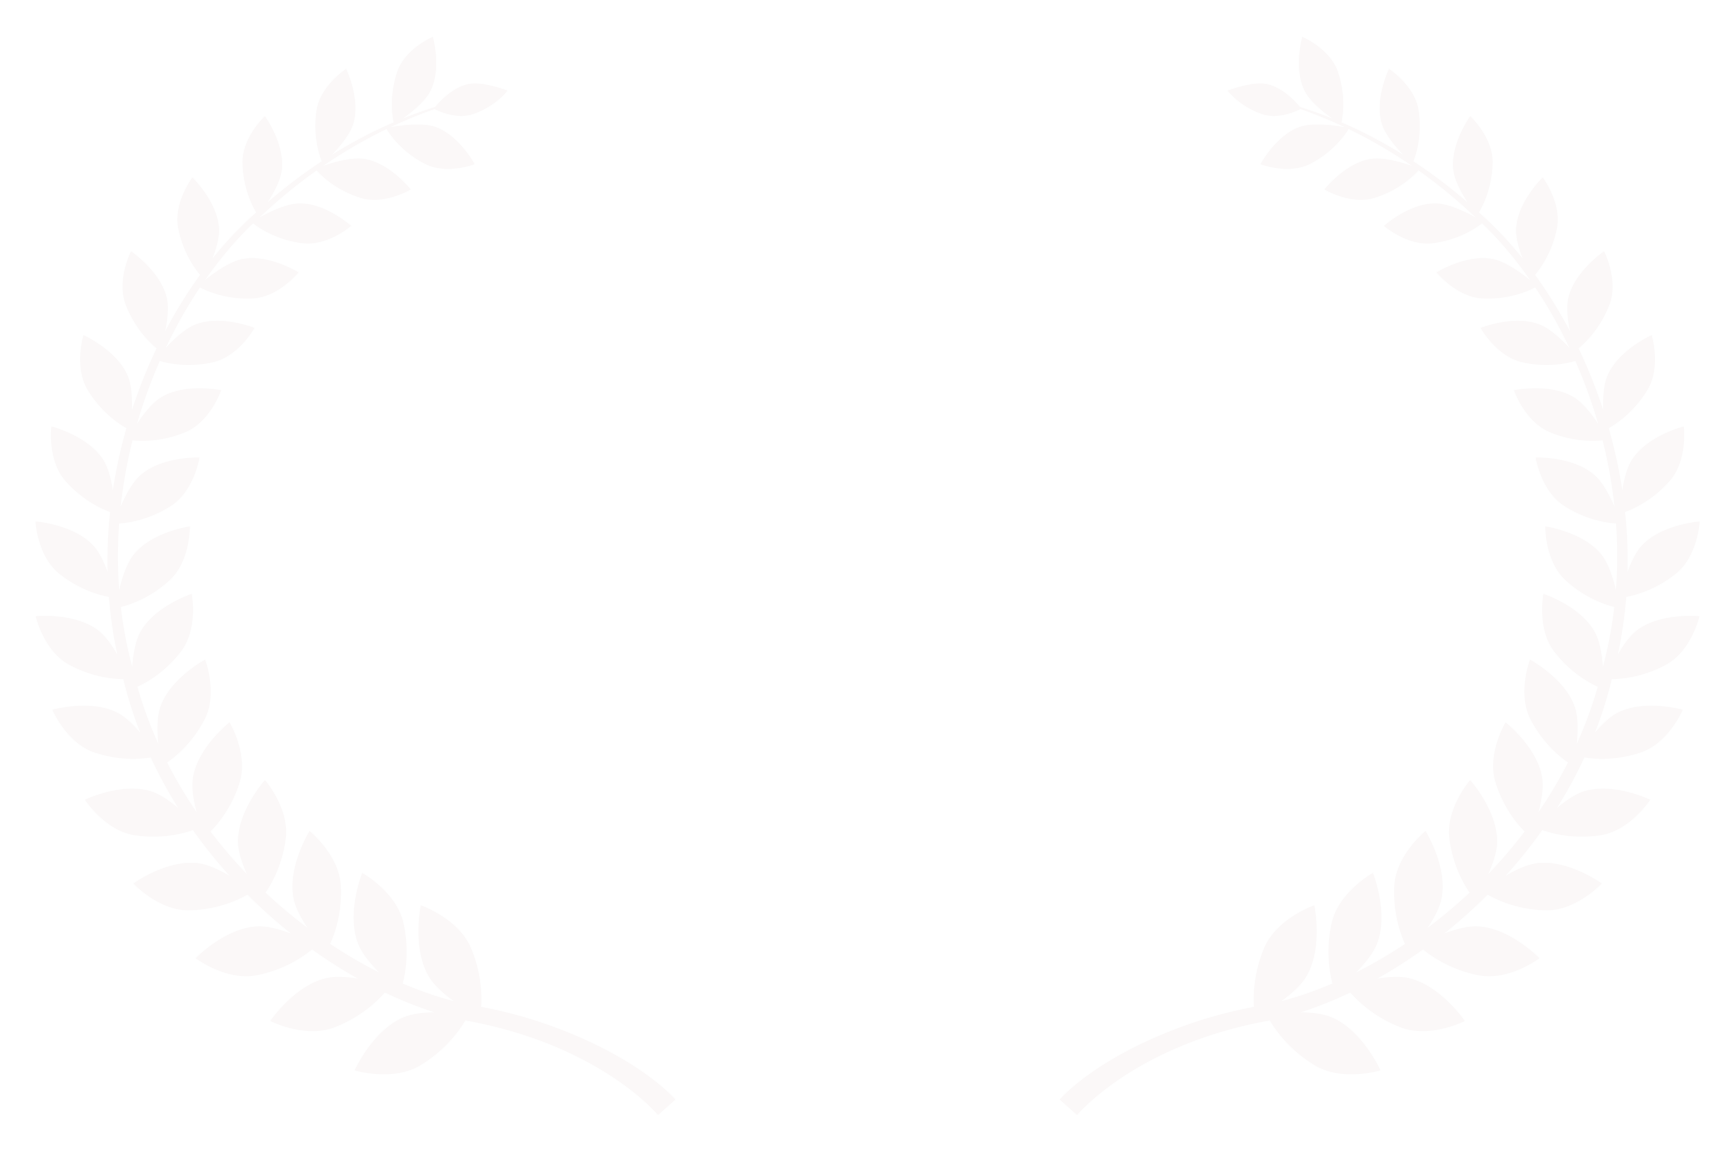 Ca Int_l Film Fest WHITE.png